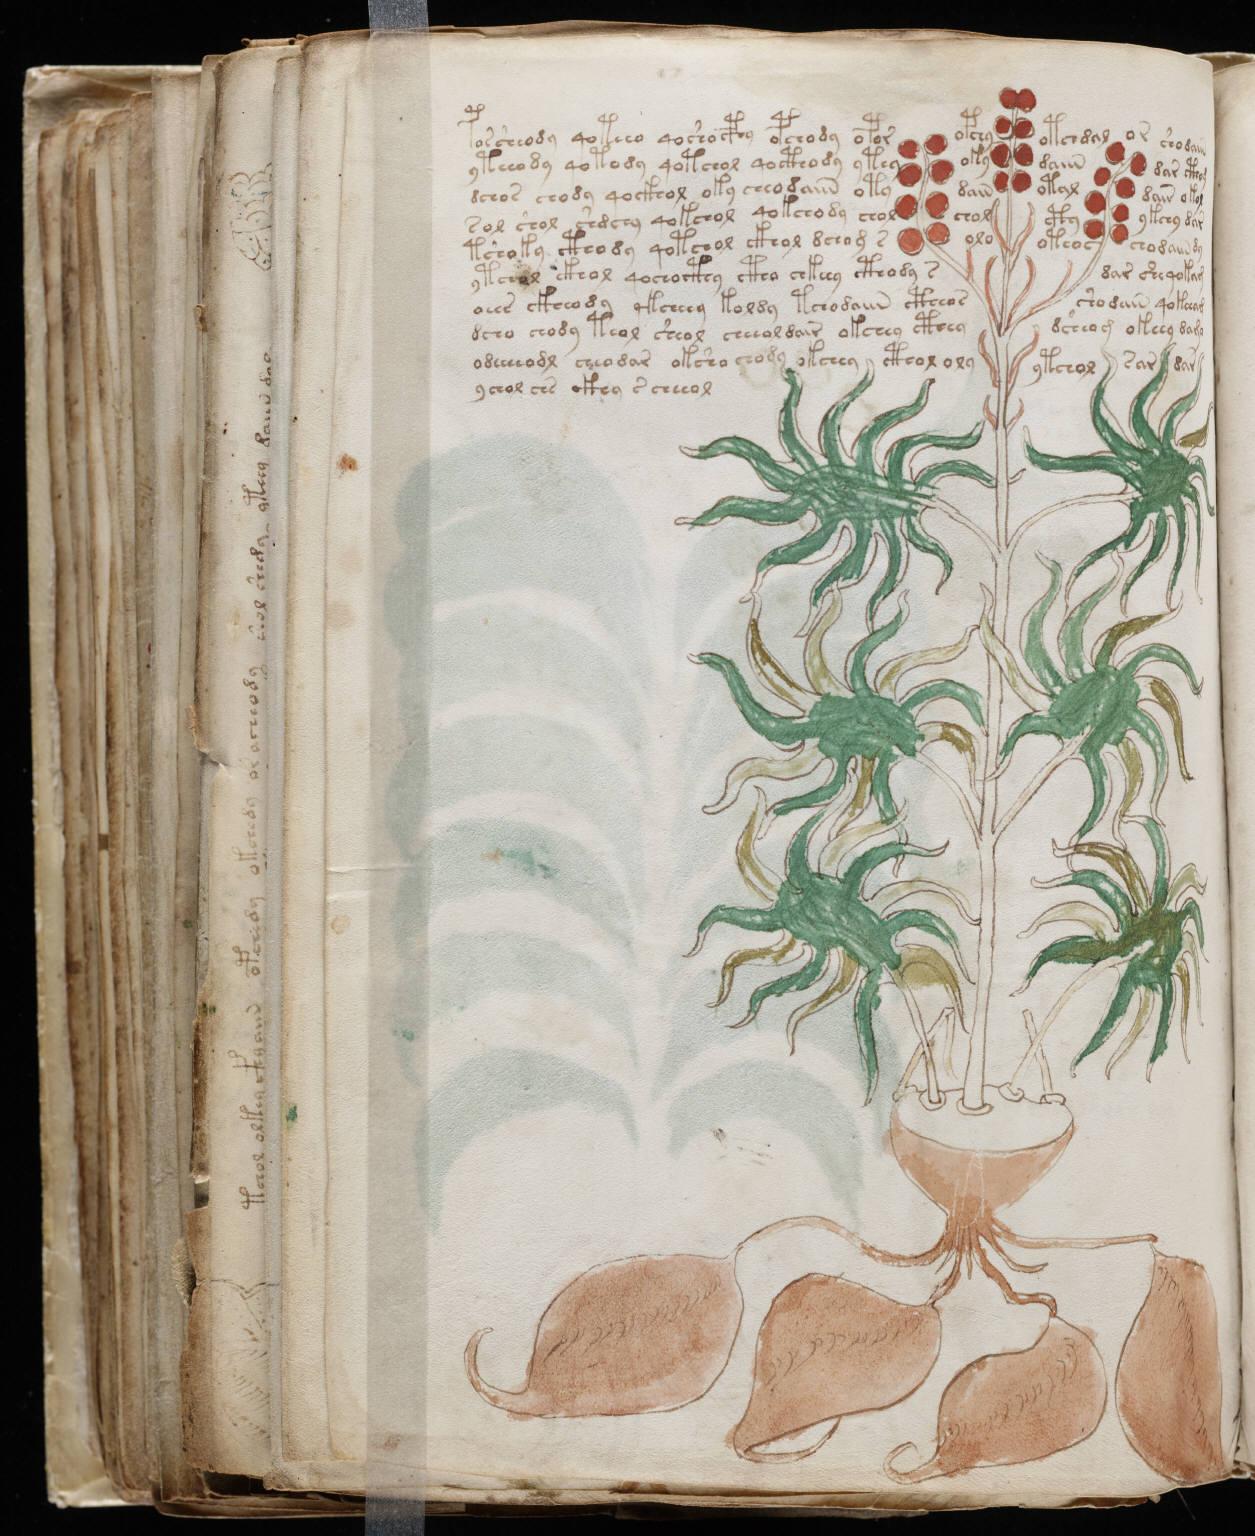 Voynich Manuscript %28168%29 ヴォイニッチ手稿(写本) どの言語にも属さない謎の文字!